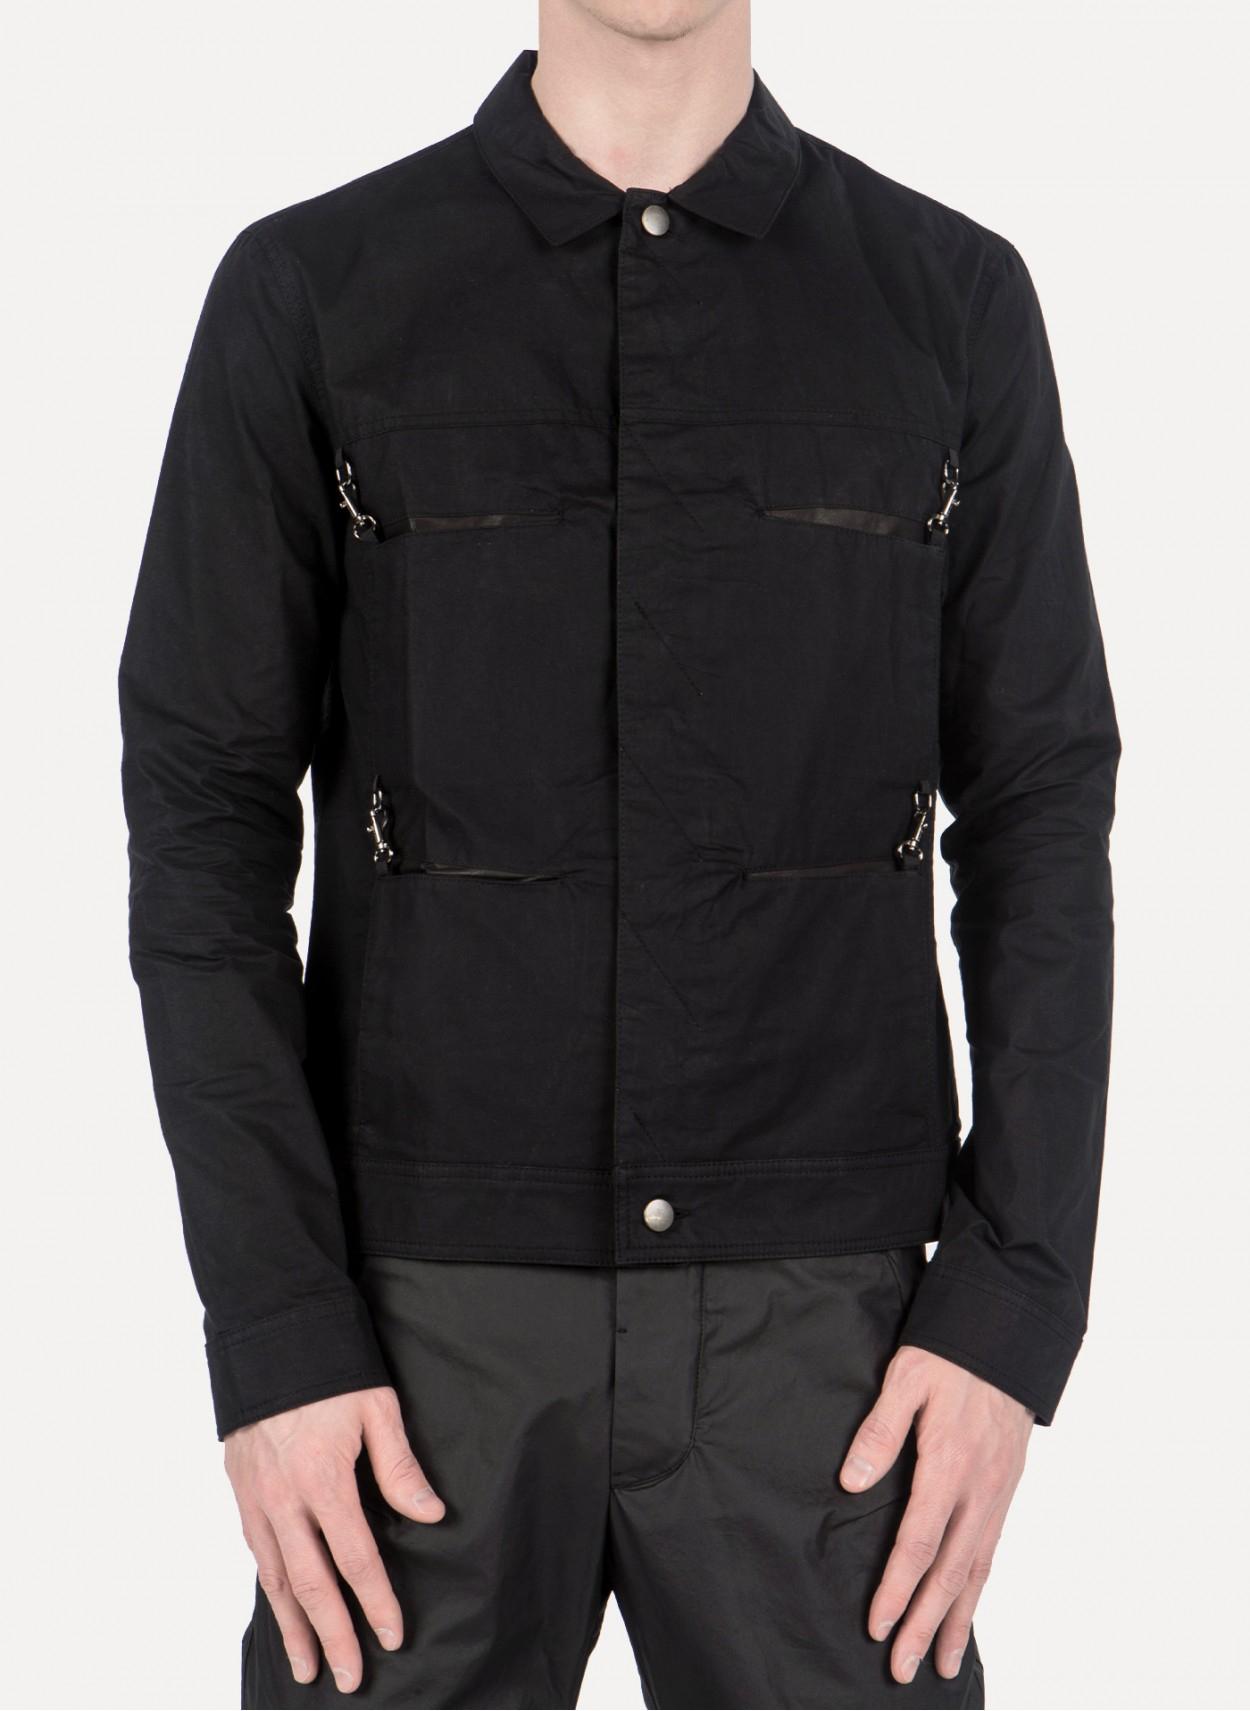 Men's heavyweight oiled nubuck cowhide biker jacket has a % wool plaid lining, three zipper front pockets, bi-swing back, and side belt tabs.5/5(26).